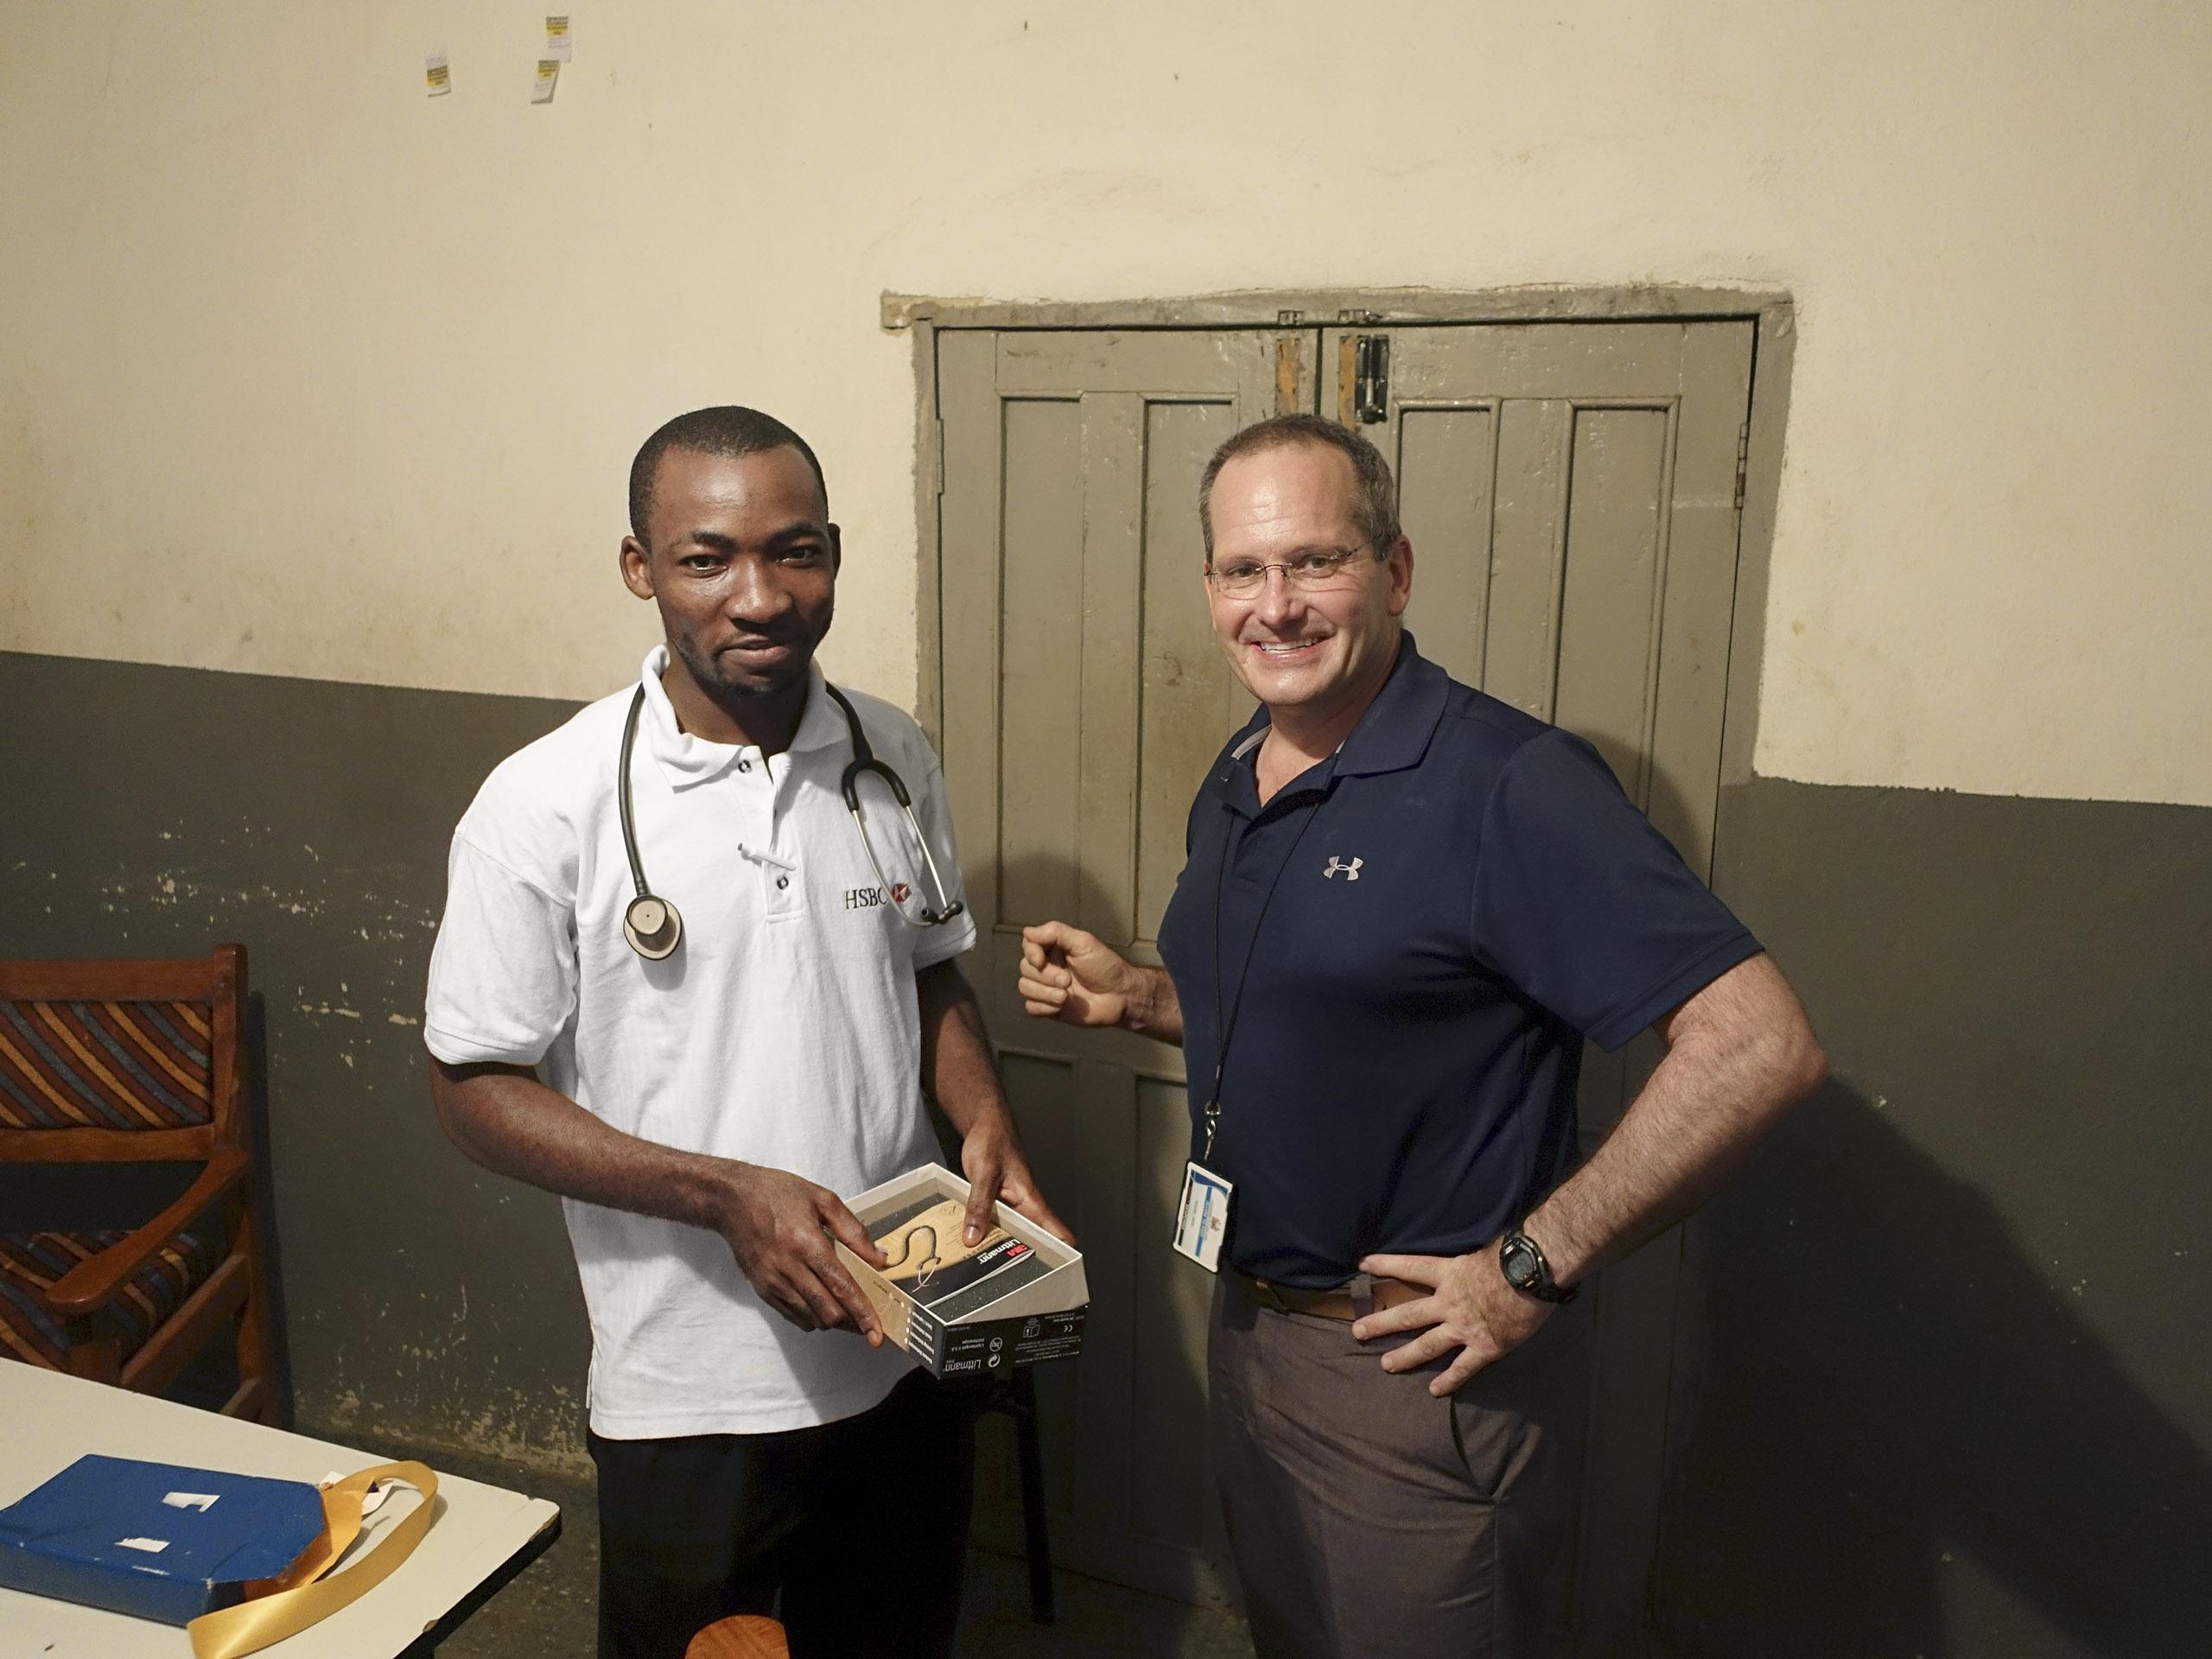 Redd, right, with local medical student Francis Abu Bayor.